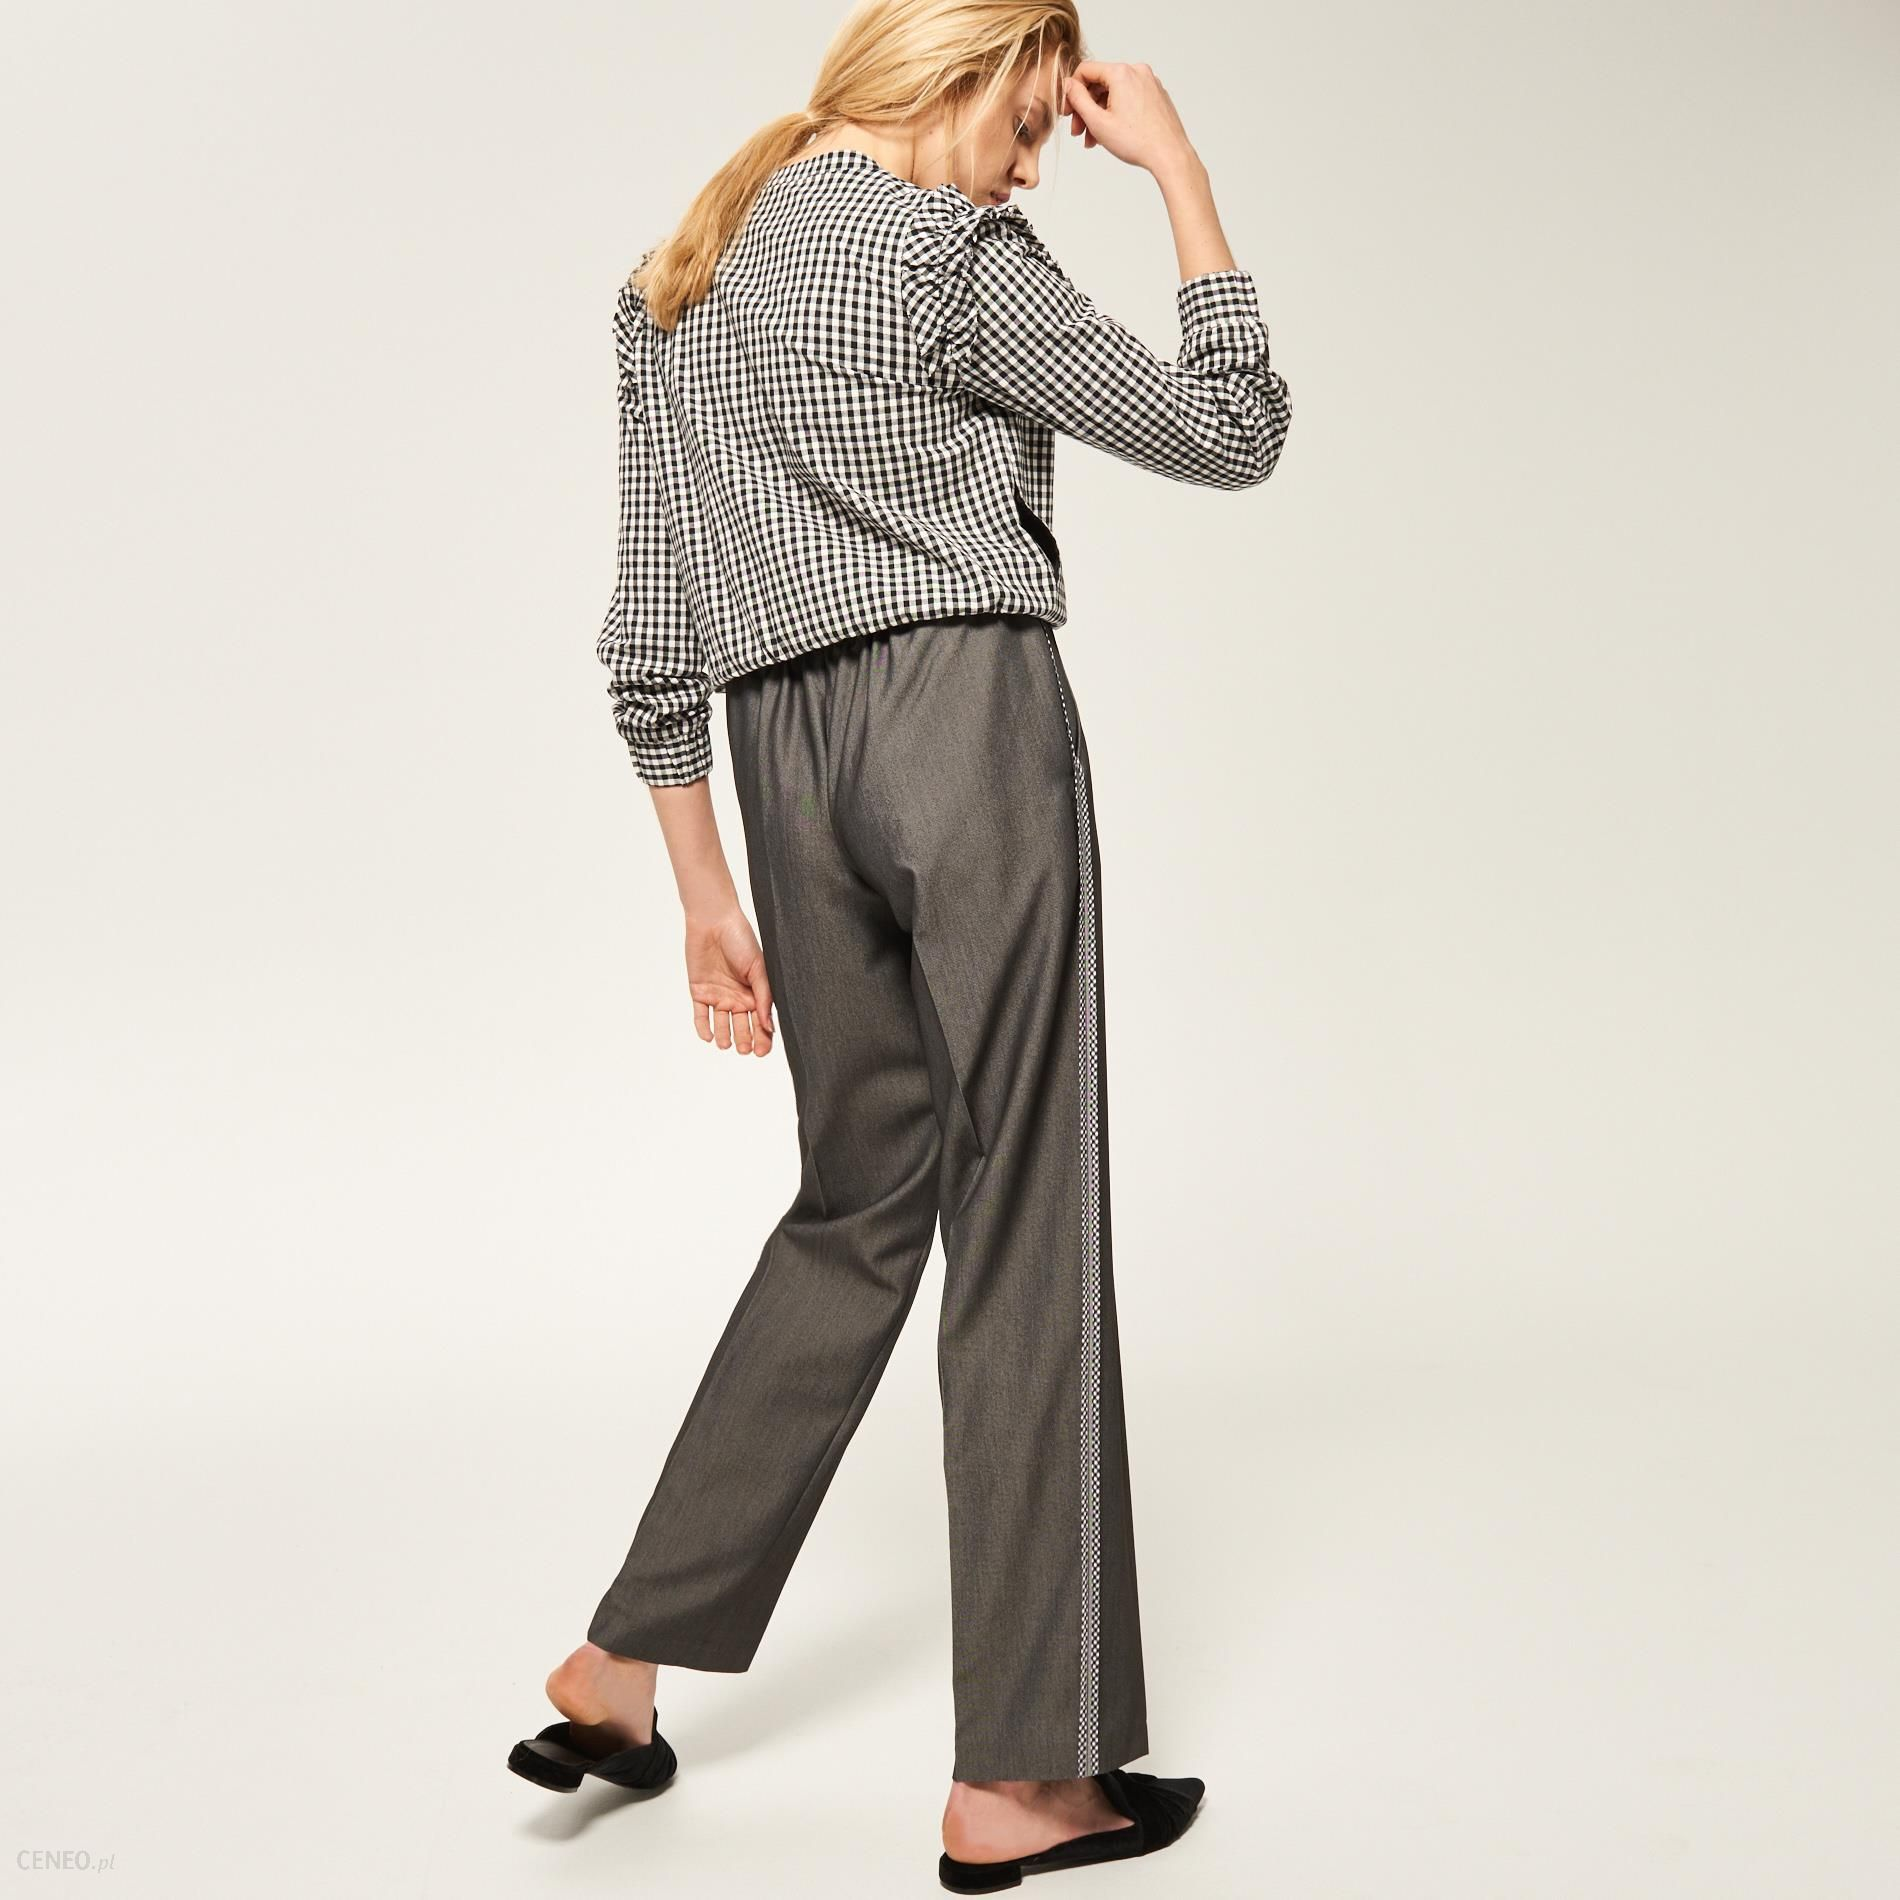 d1f4aae4d71754 Reserved - Eleganckie spodnie z lampasem - Szary - damski - Ceny i opinie -  Ceneo.pl